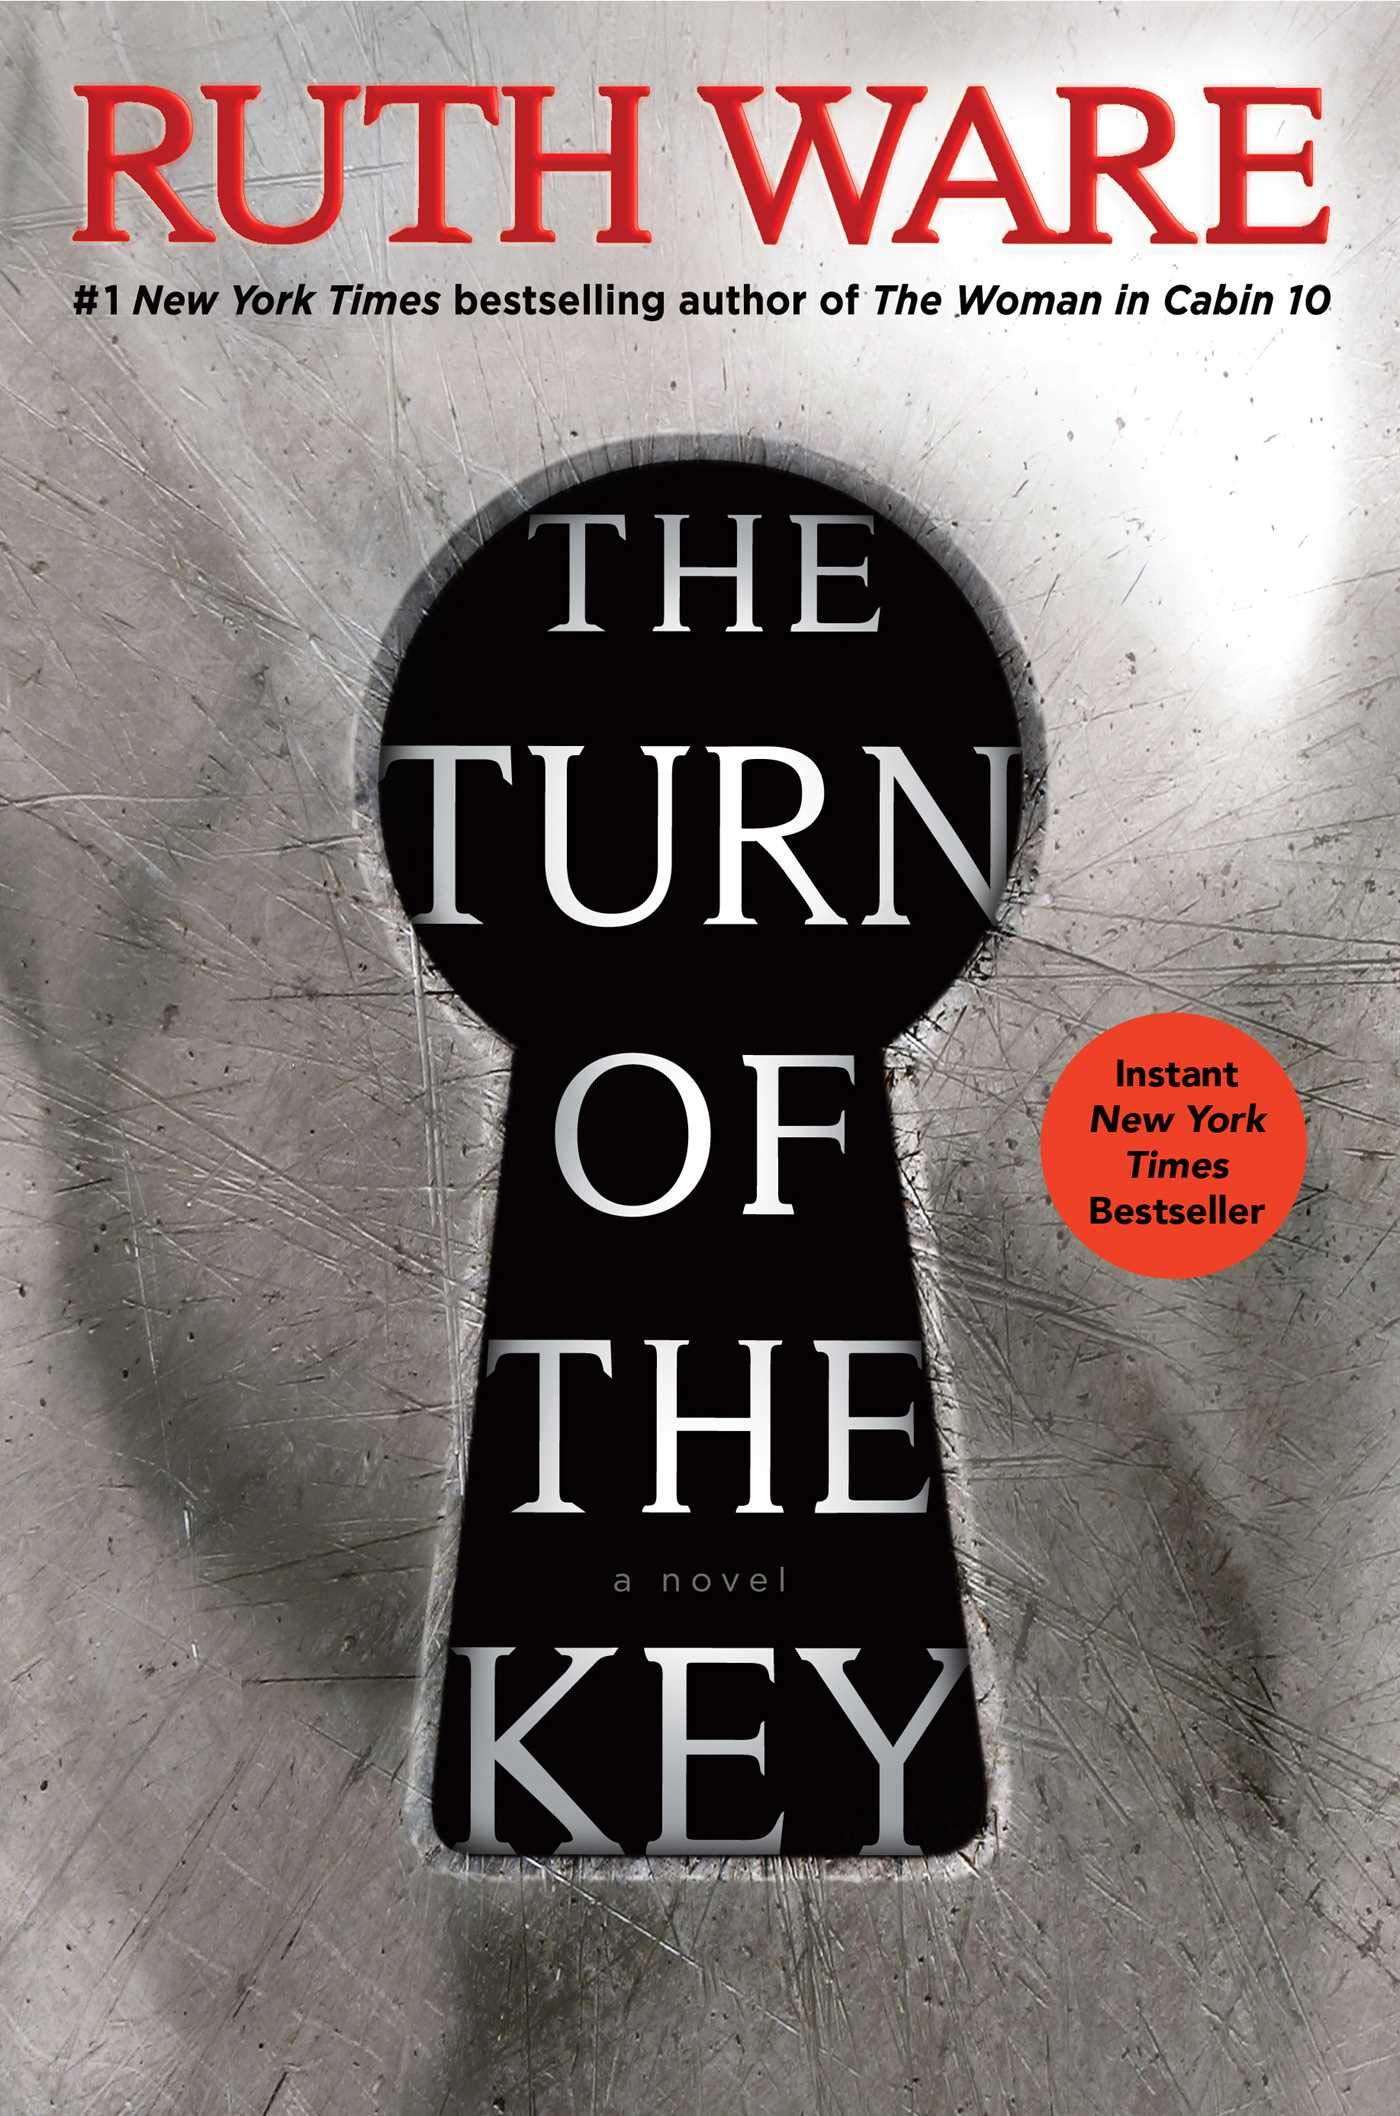 Amazon.com: The Turn of the Key (9781501188770): Ware, Ruth: Books